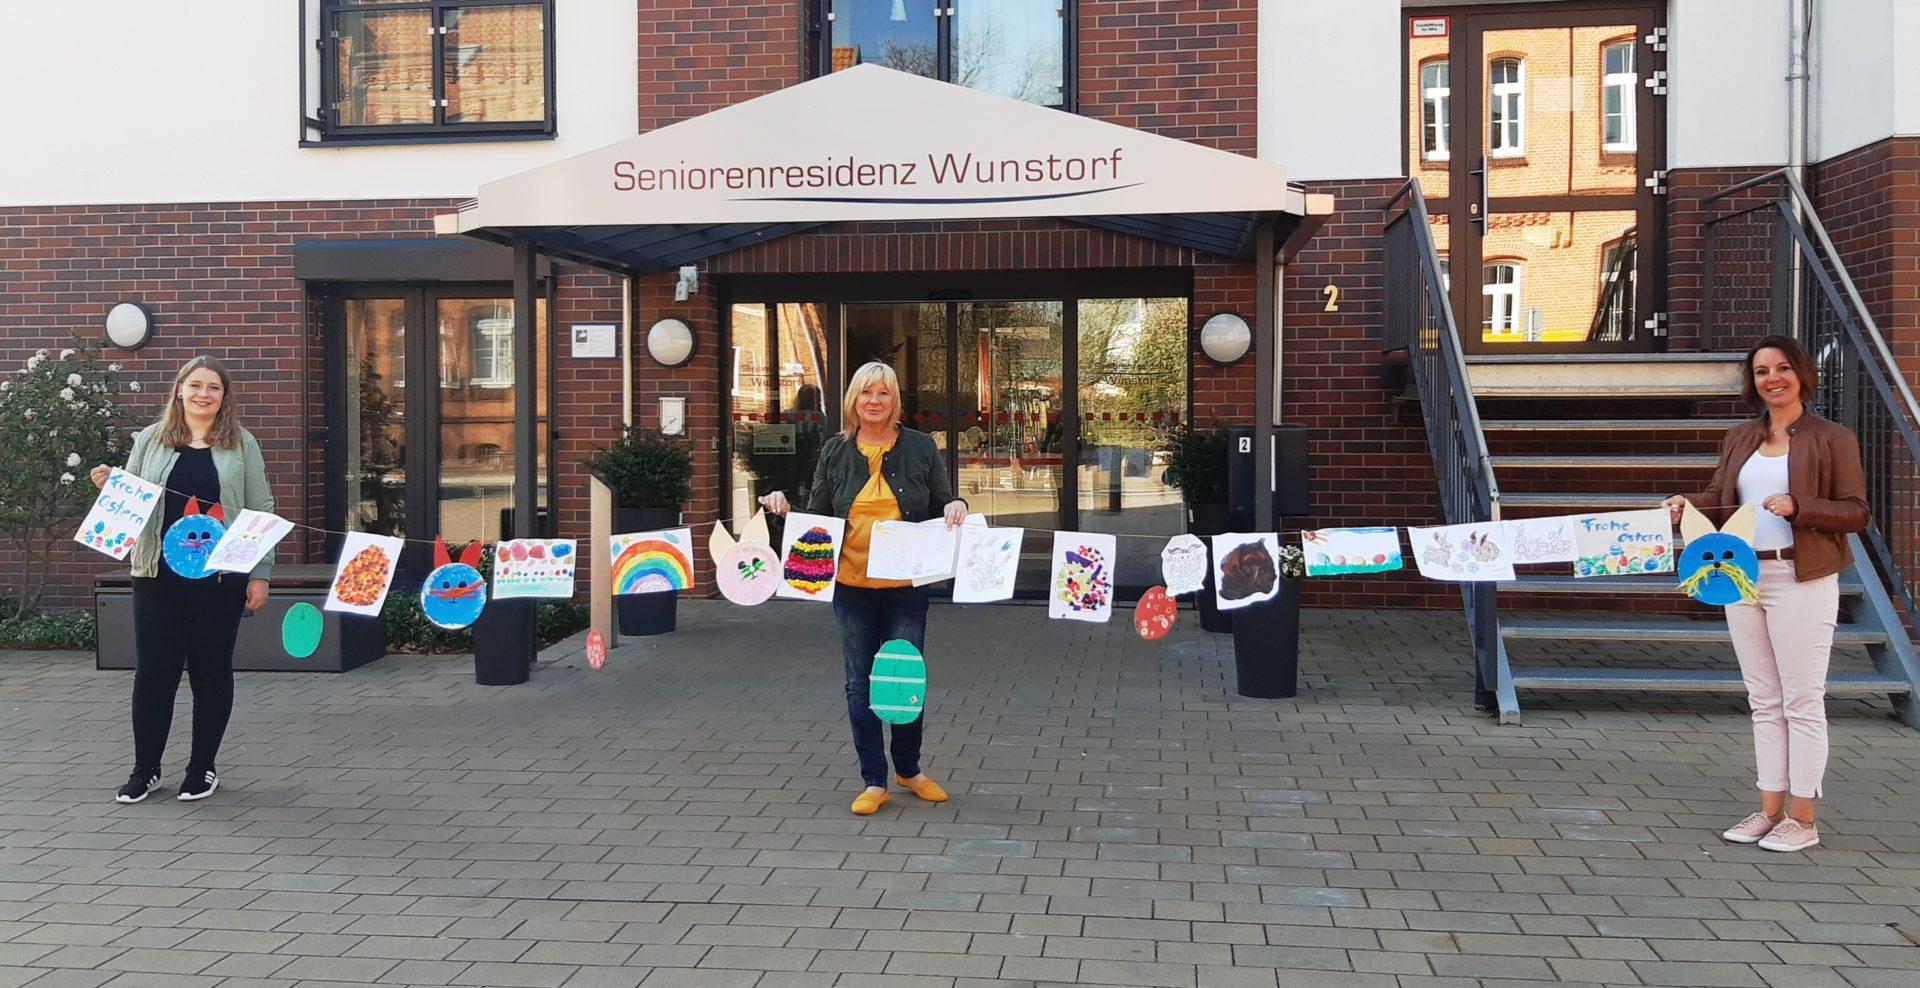 Wunstorf News